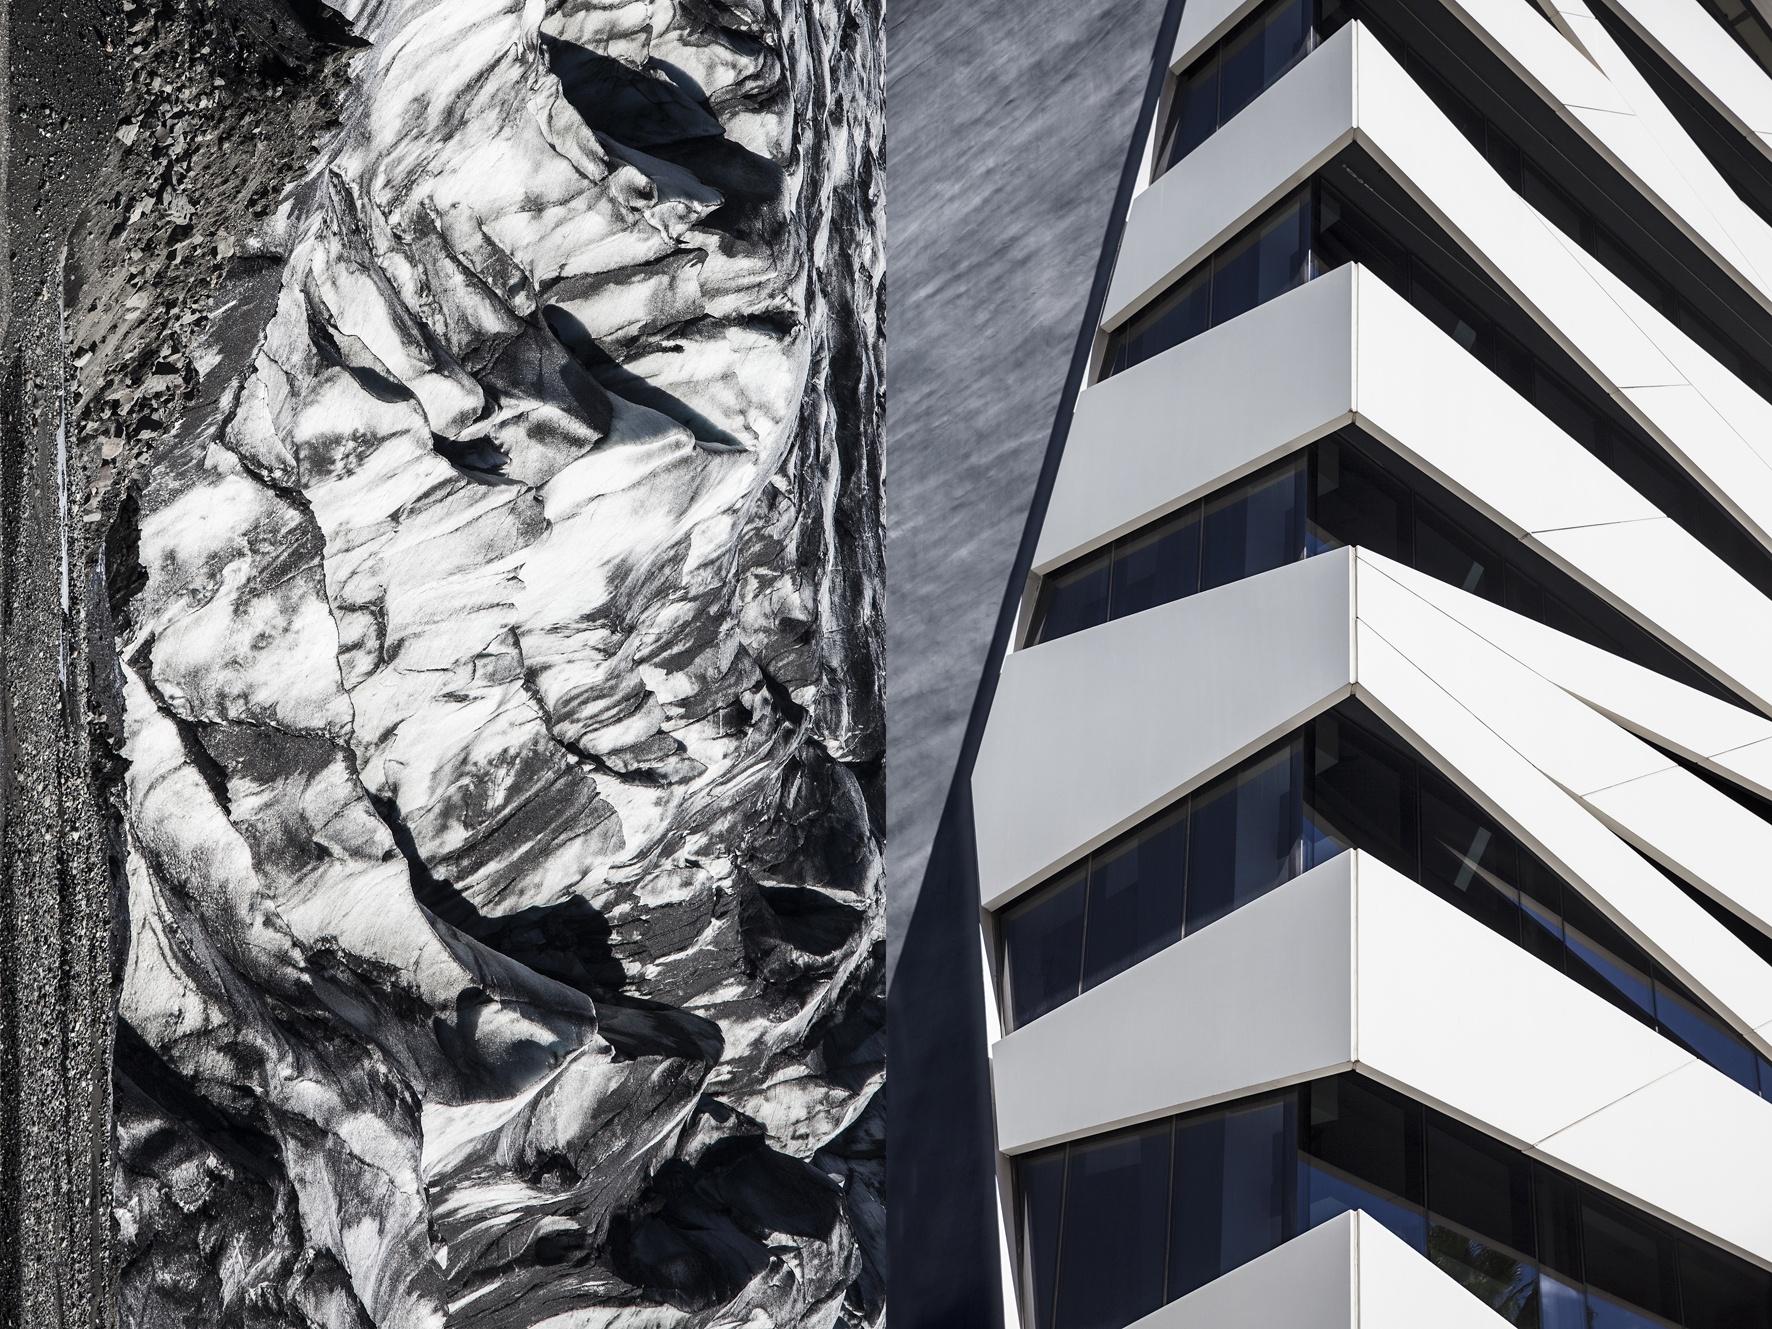 Abstracción Geométrica - Como dos gotas de poesía   - Como dos gotas de poesía, fotografías de LaraBisbe